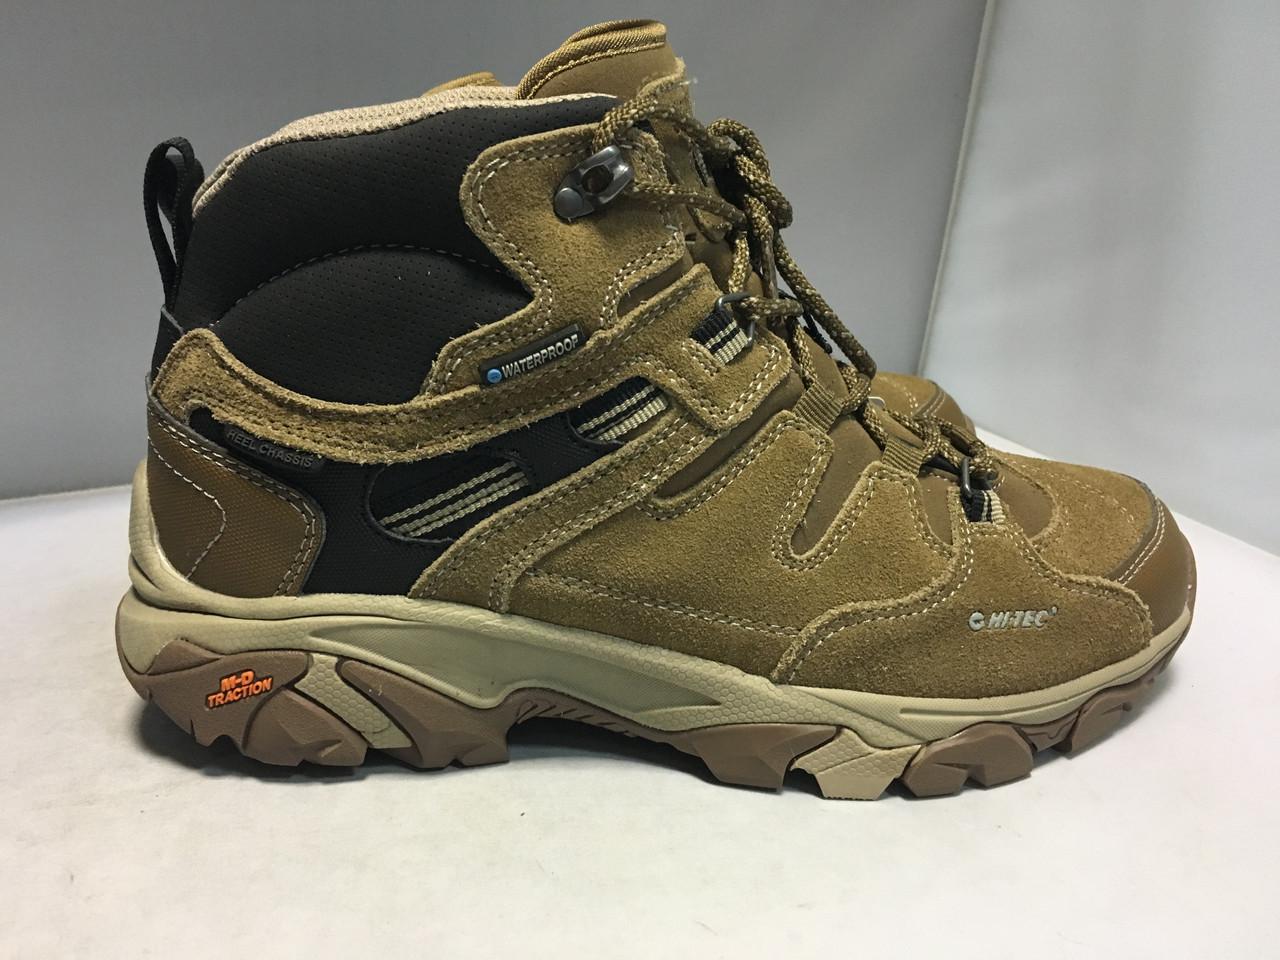 Зимние ботинки Hi-Tec, 40 размер